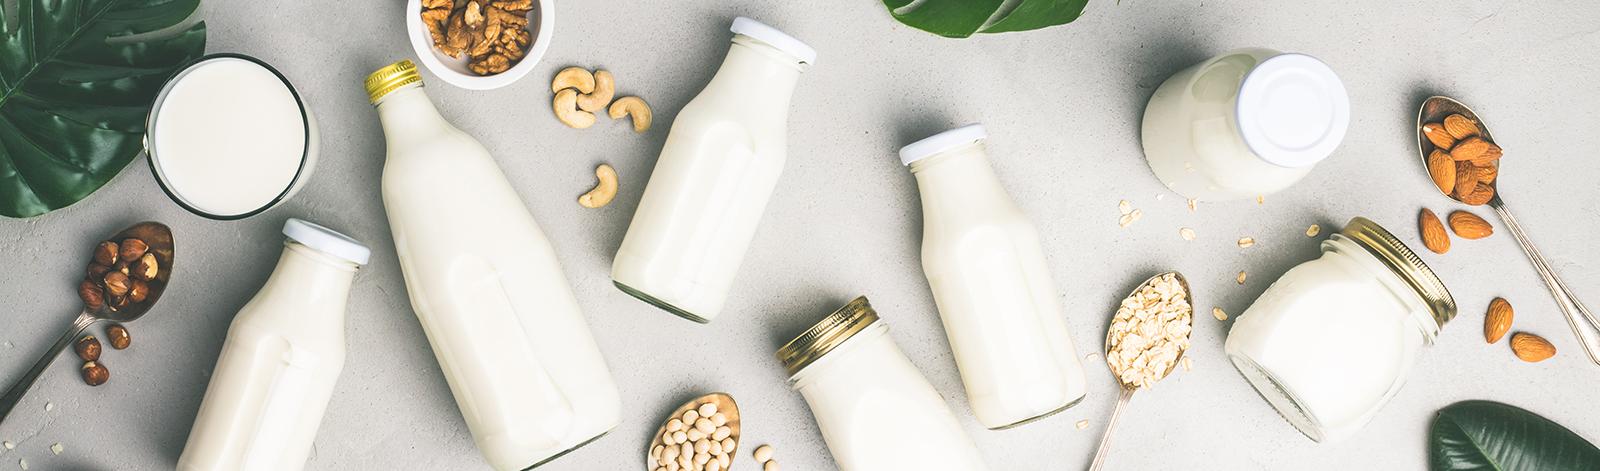 Dairy free milk alternatives and ingredients